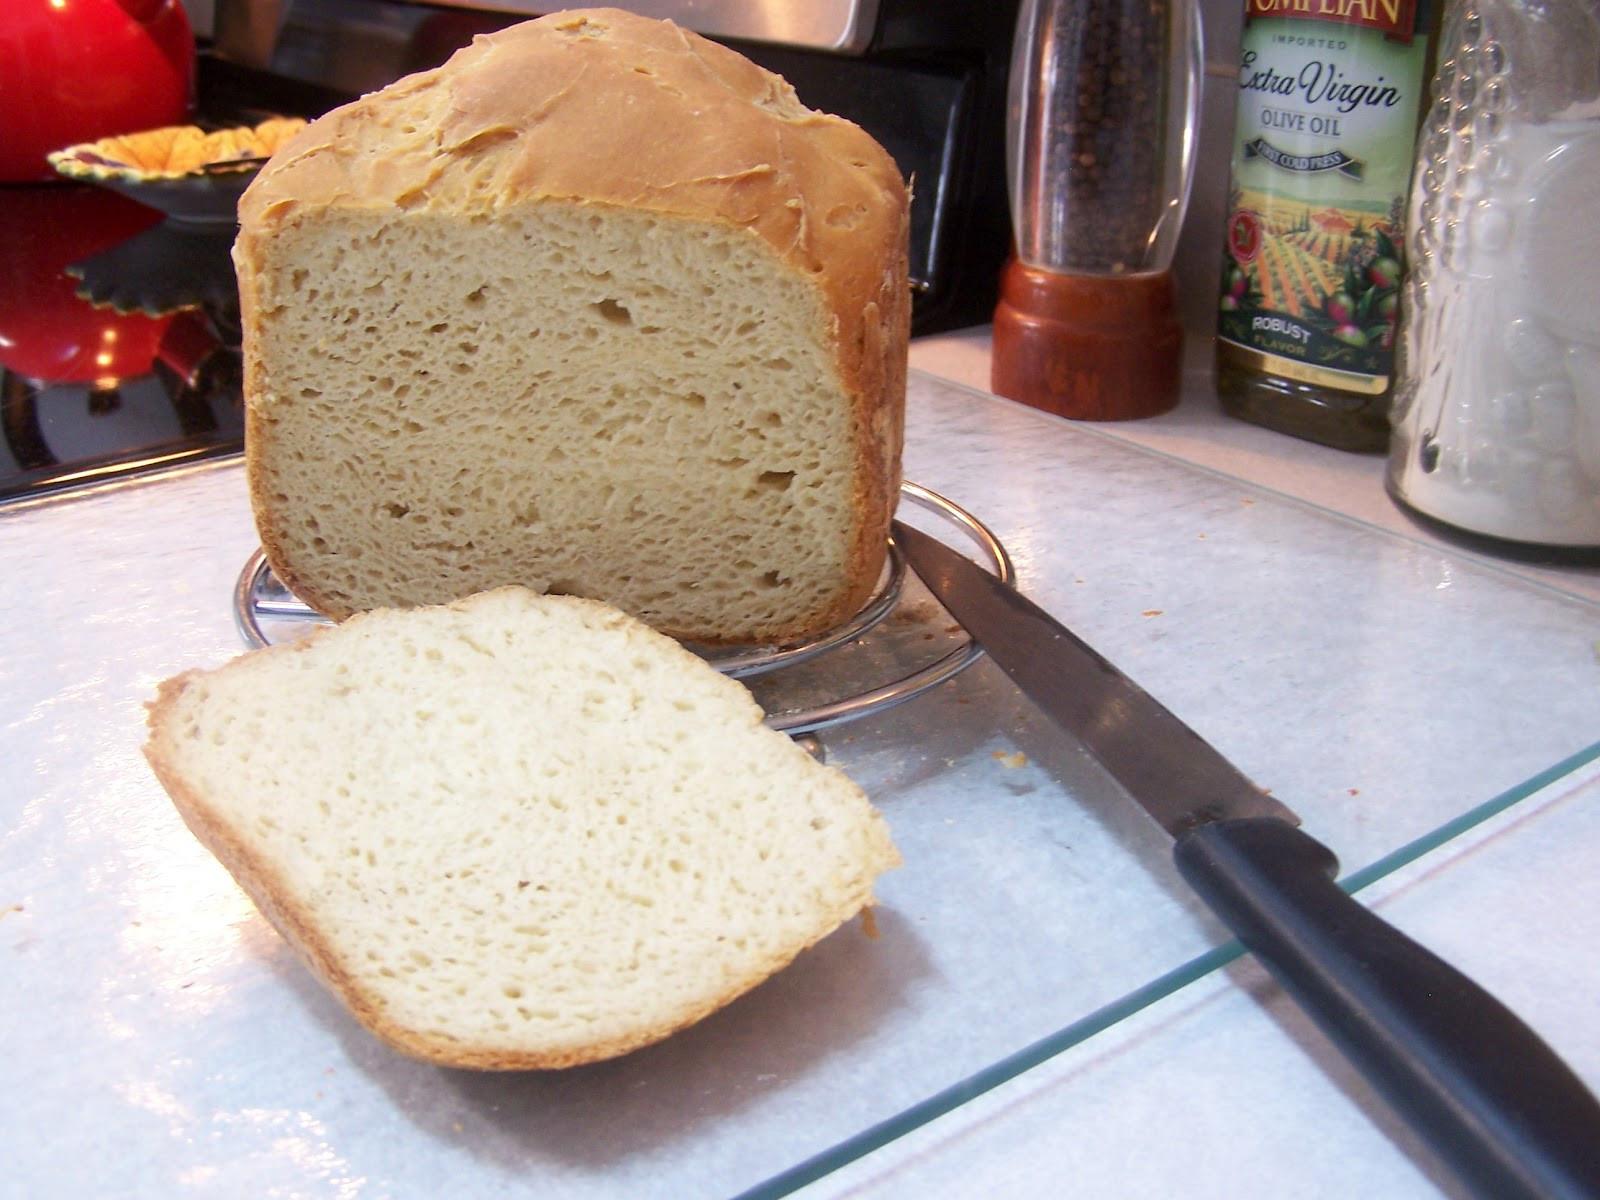 Dairy Free Bread Machine Recipes  Spectacular Gluten Free Bread in the Bread Machine